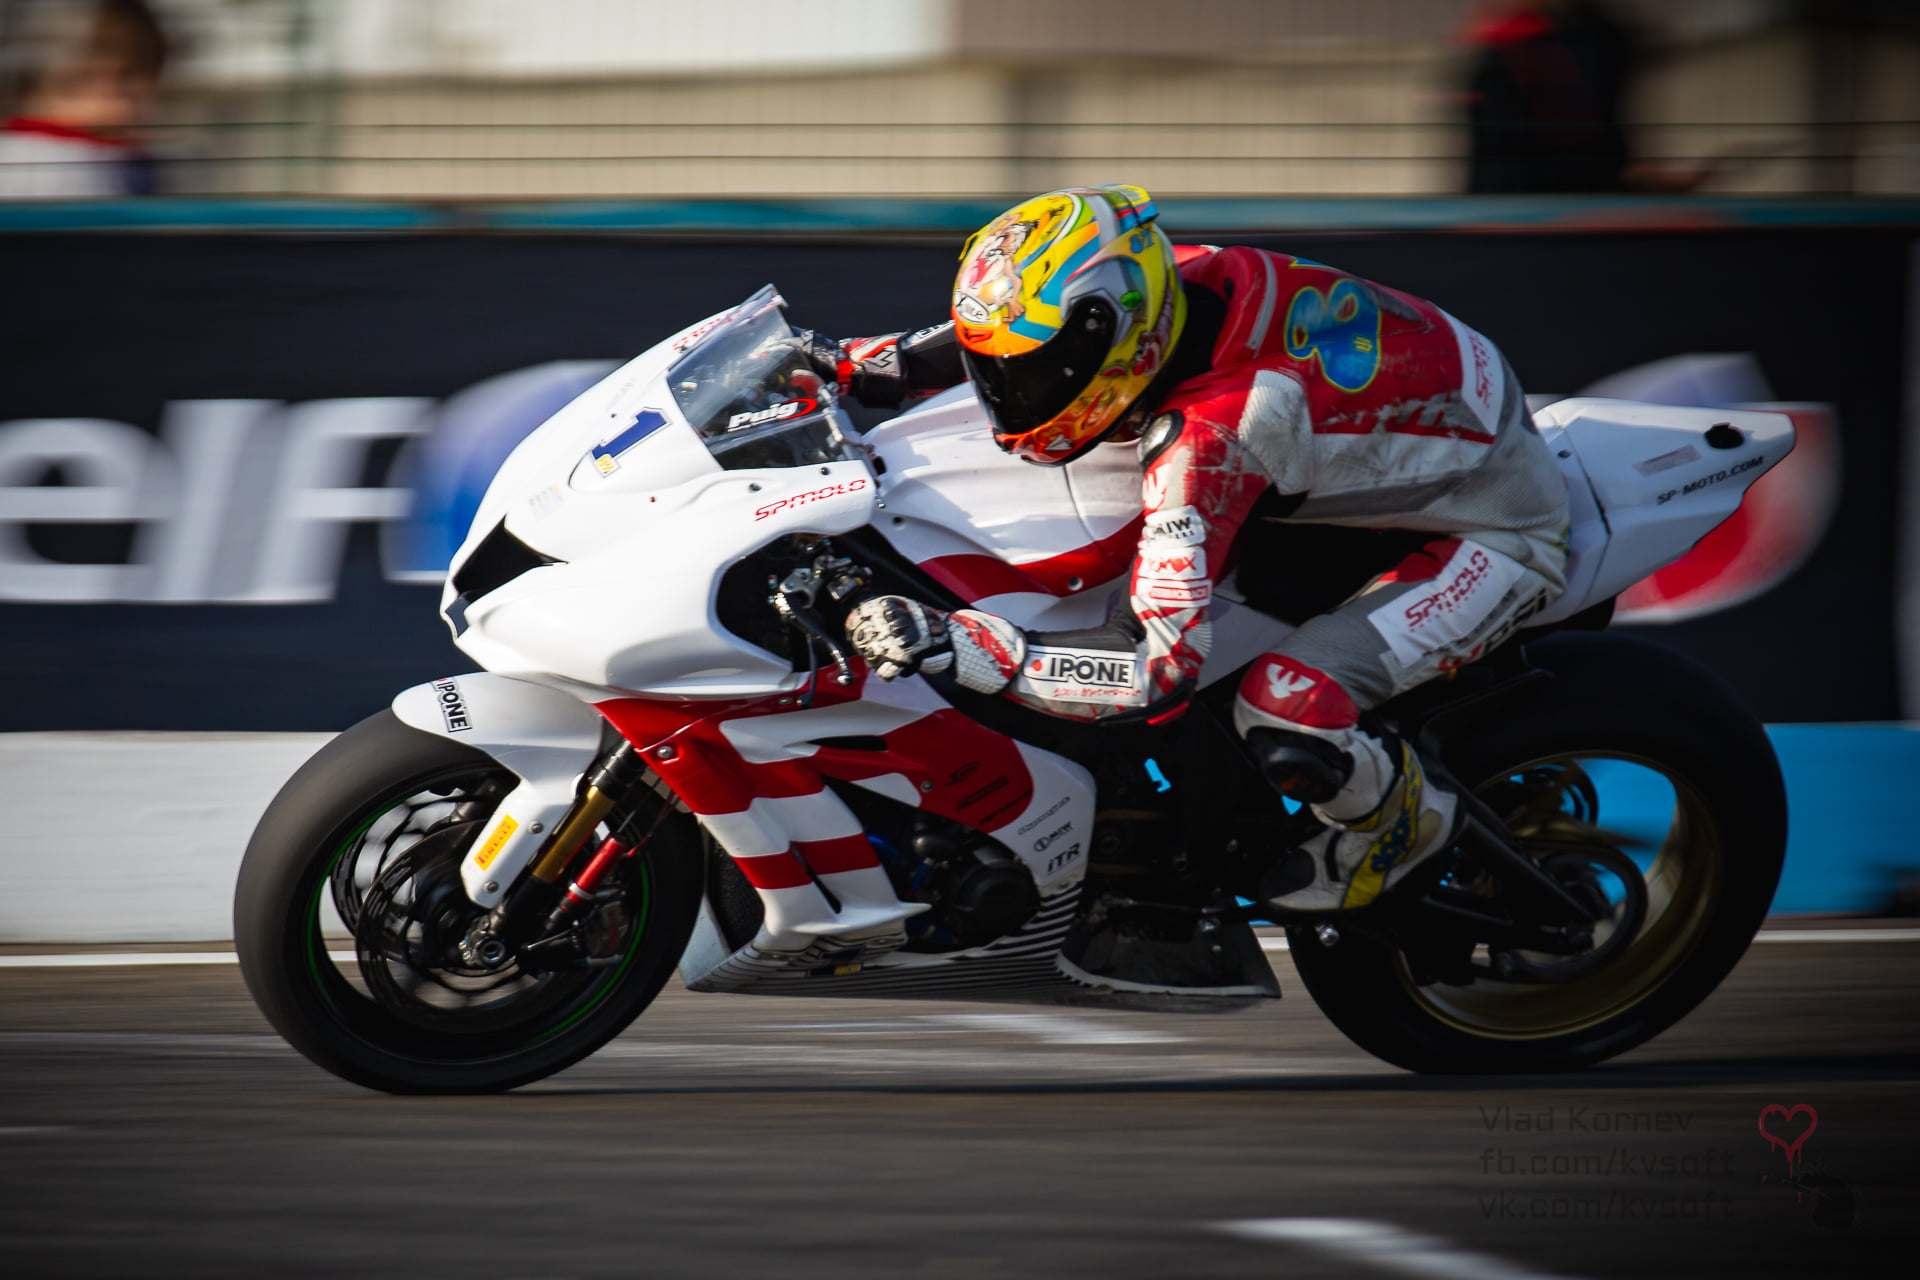 5-6_etap_MotoGPUkraine_127